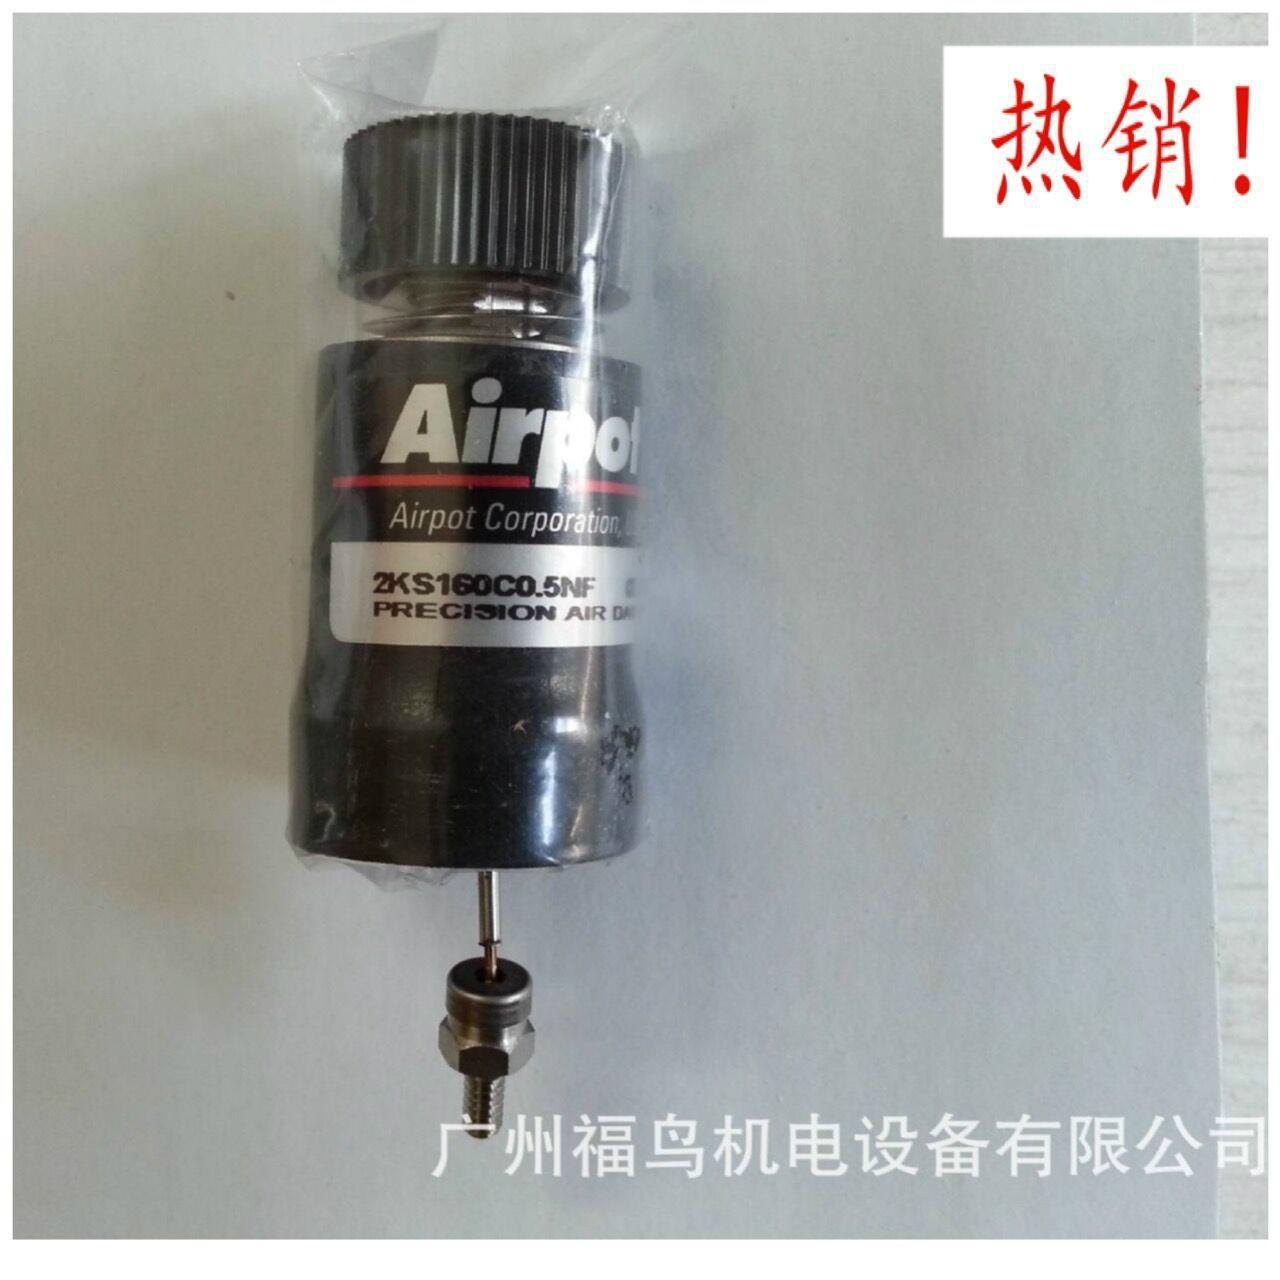 AIRPOT玻璃氣缸, 阻尼器  型號: 2KS160C0.5NF